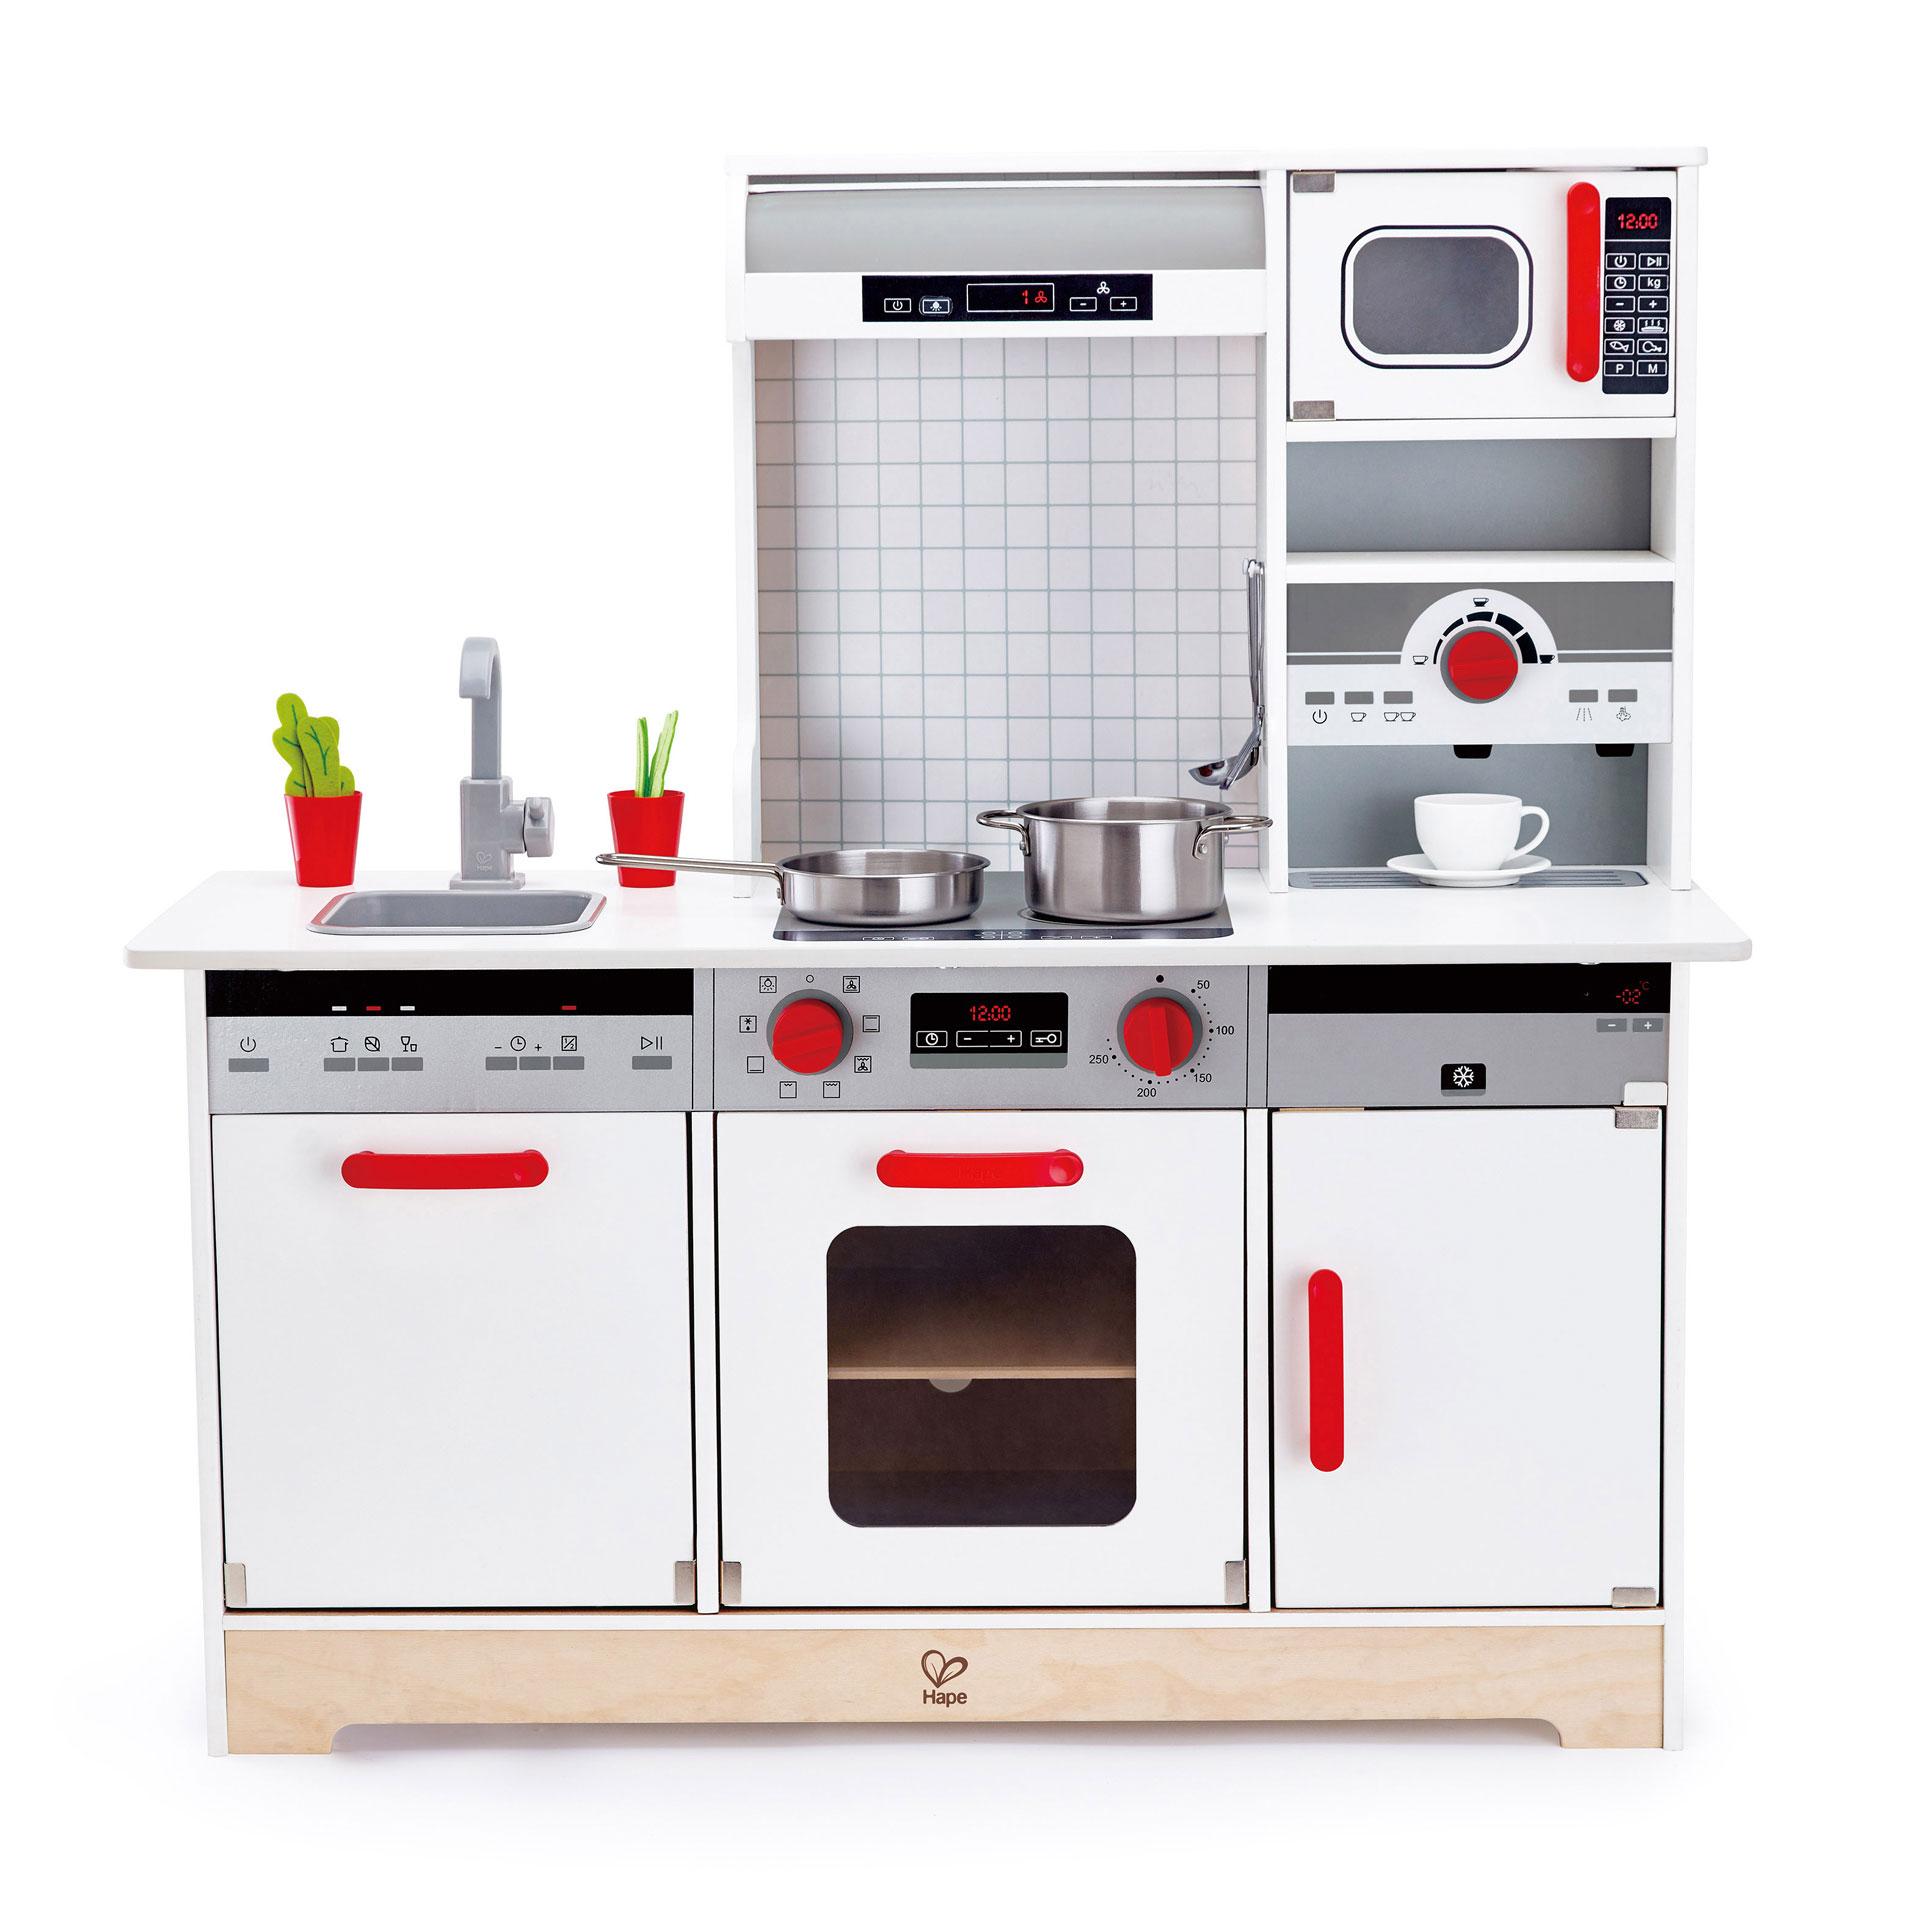 Hape All In 1 Kids Toddler Wooden Pretend Play Kitchen Set